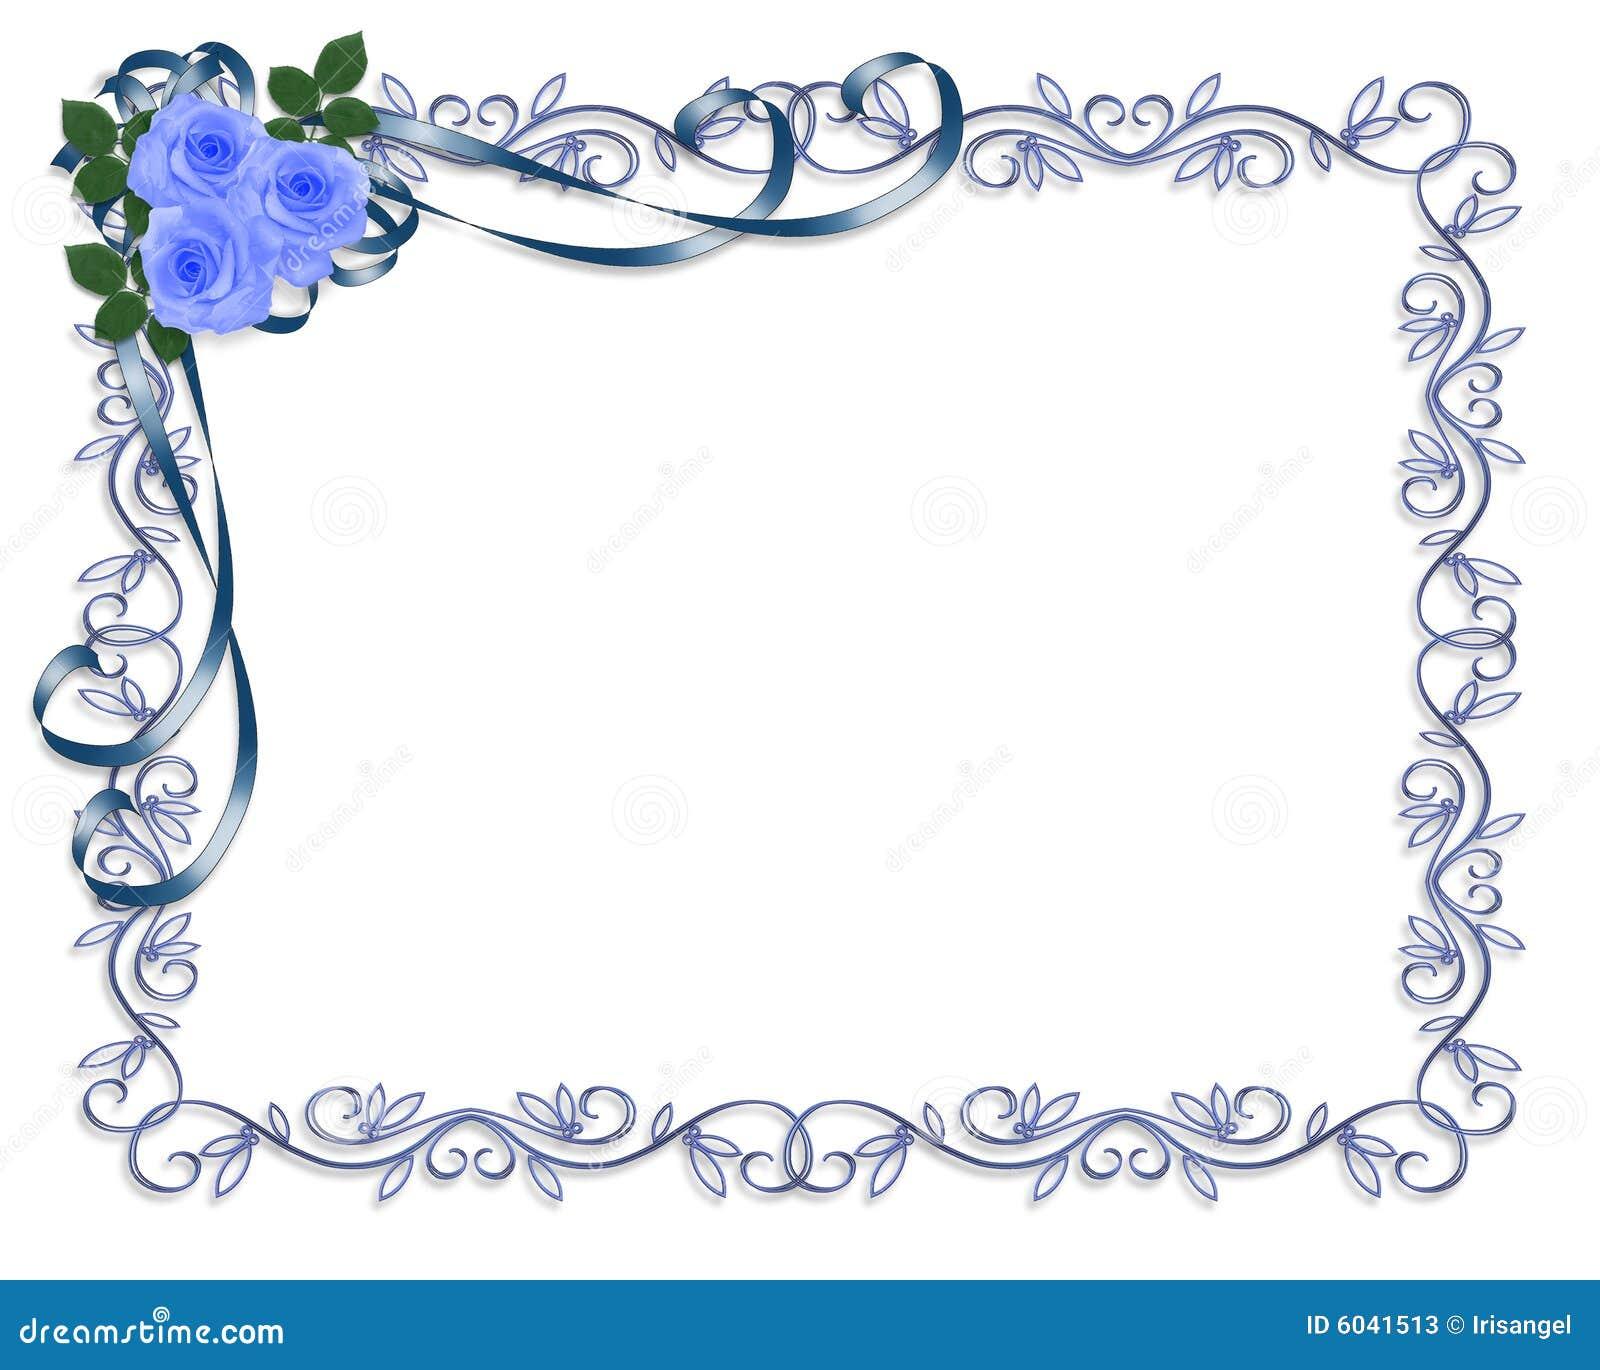 Rose Wedding Invitations for great invitations ideas